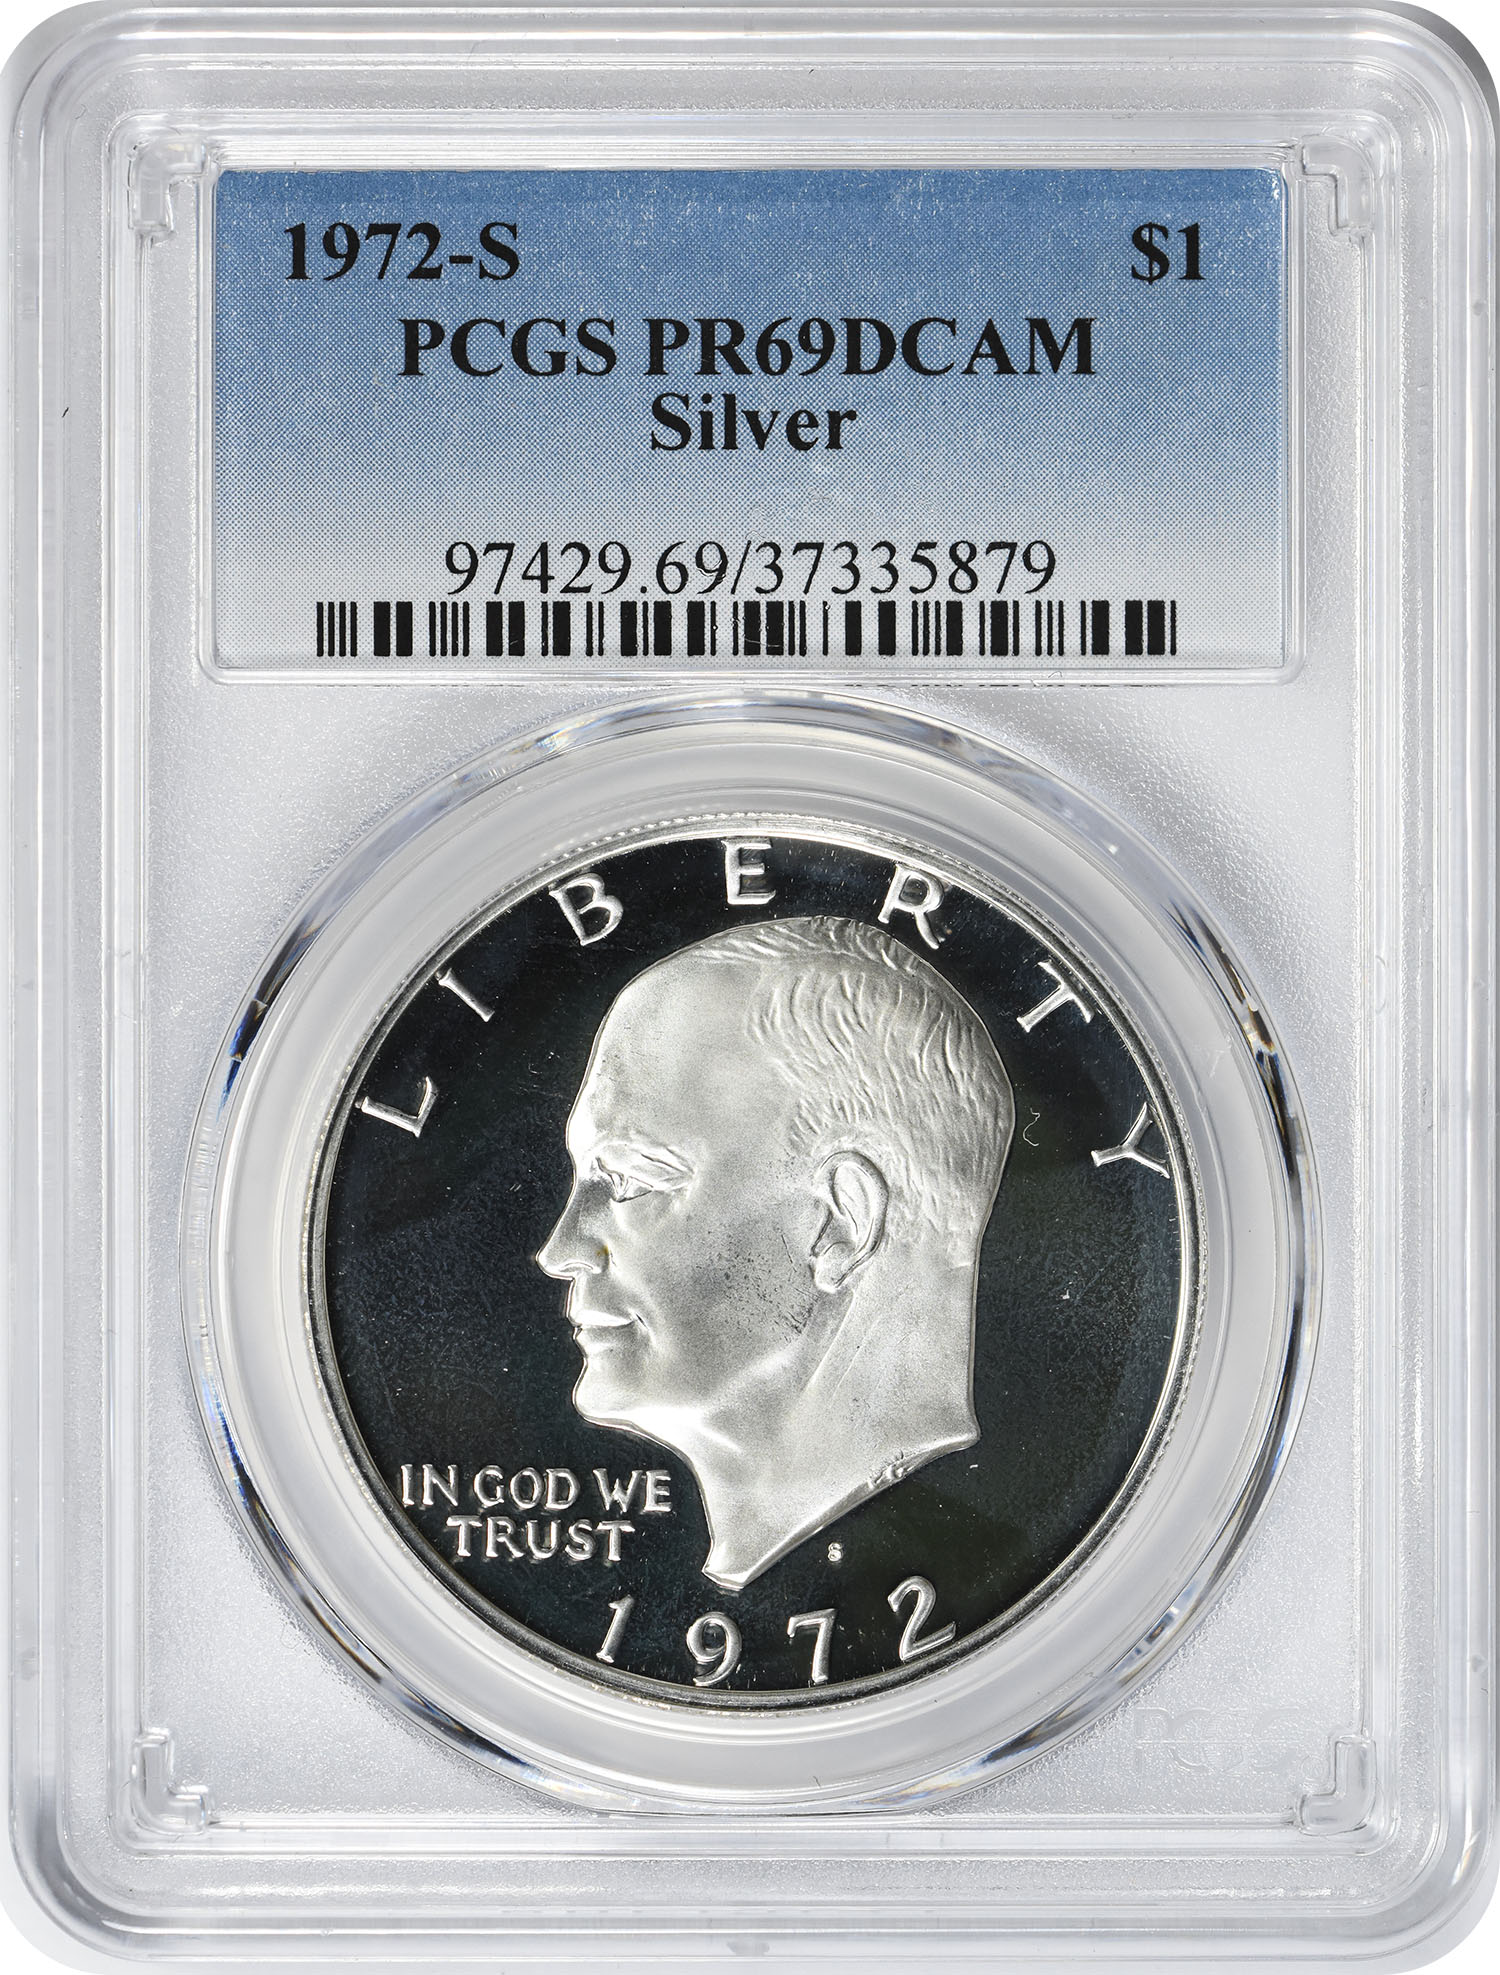 1972-S Eisenhower Dollar, PR69DCAM, Silver, PCGS